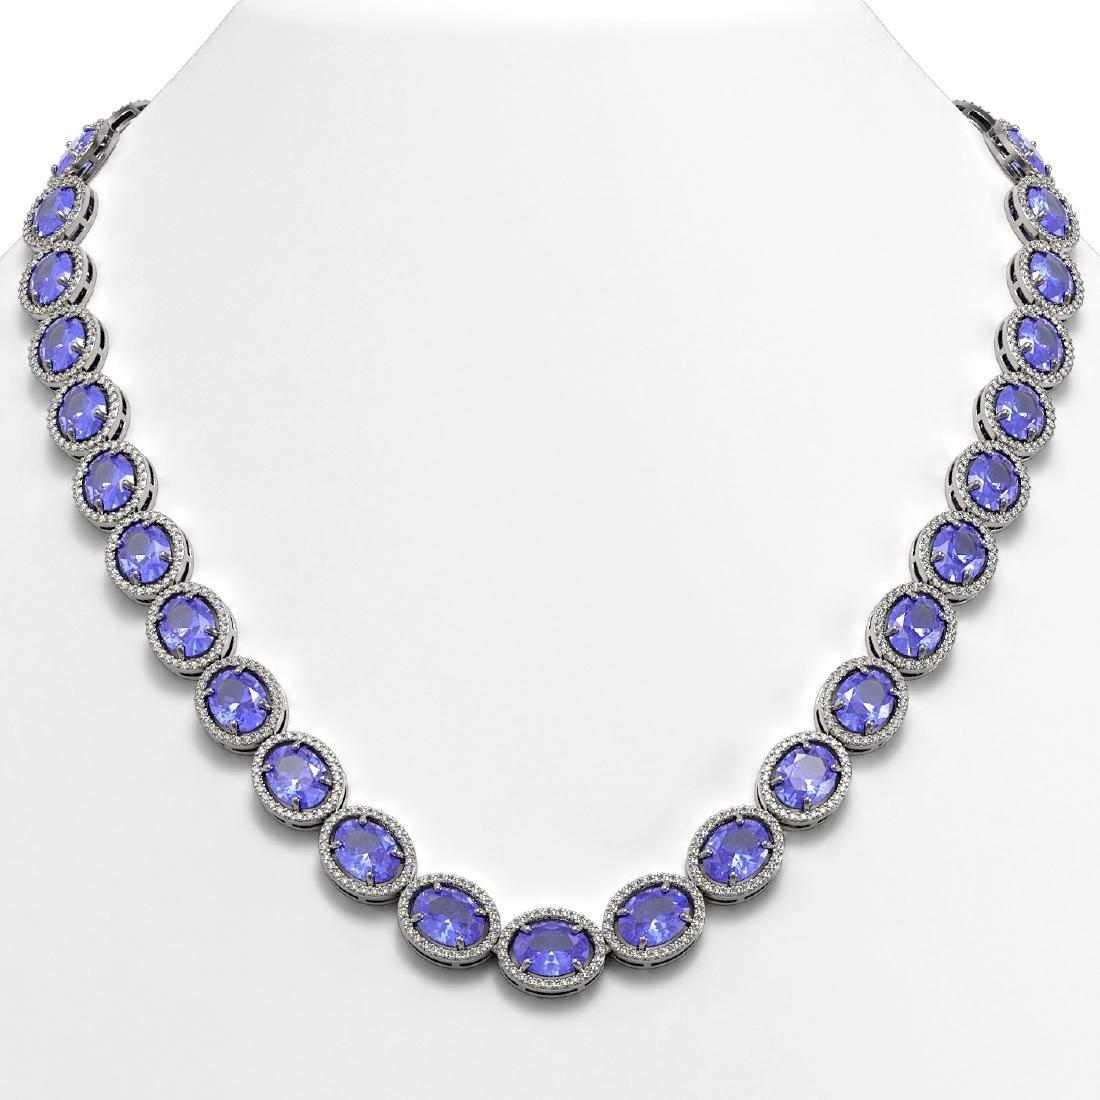 62.99 CTW Tanzanite & Diamond Halo Necklace 10K White